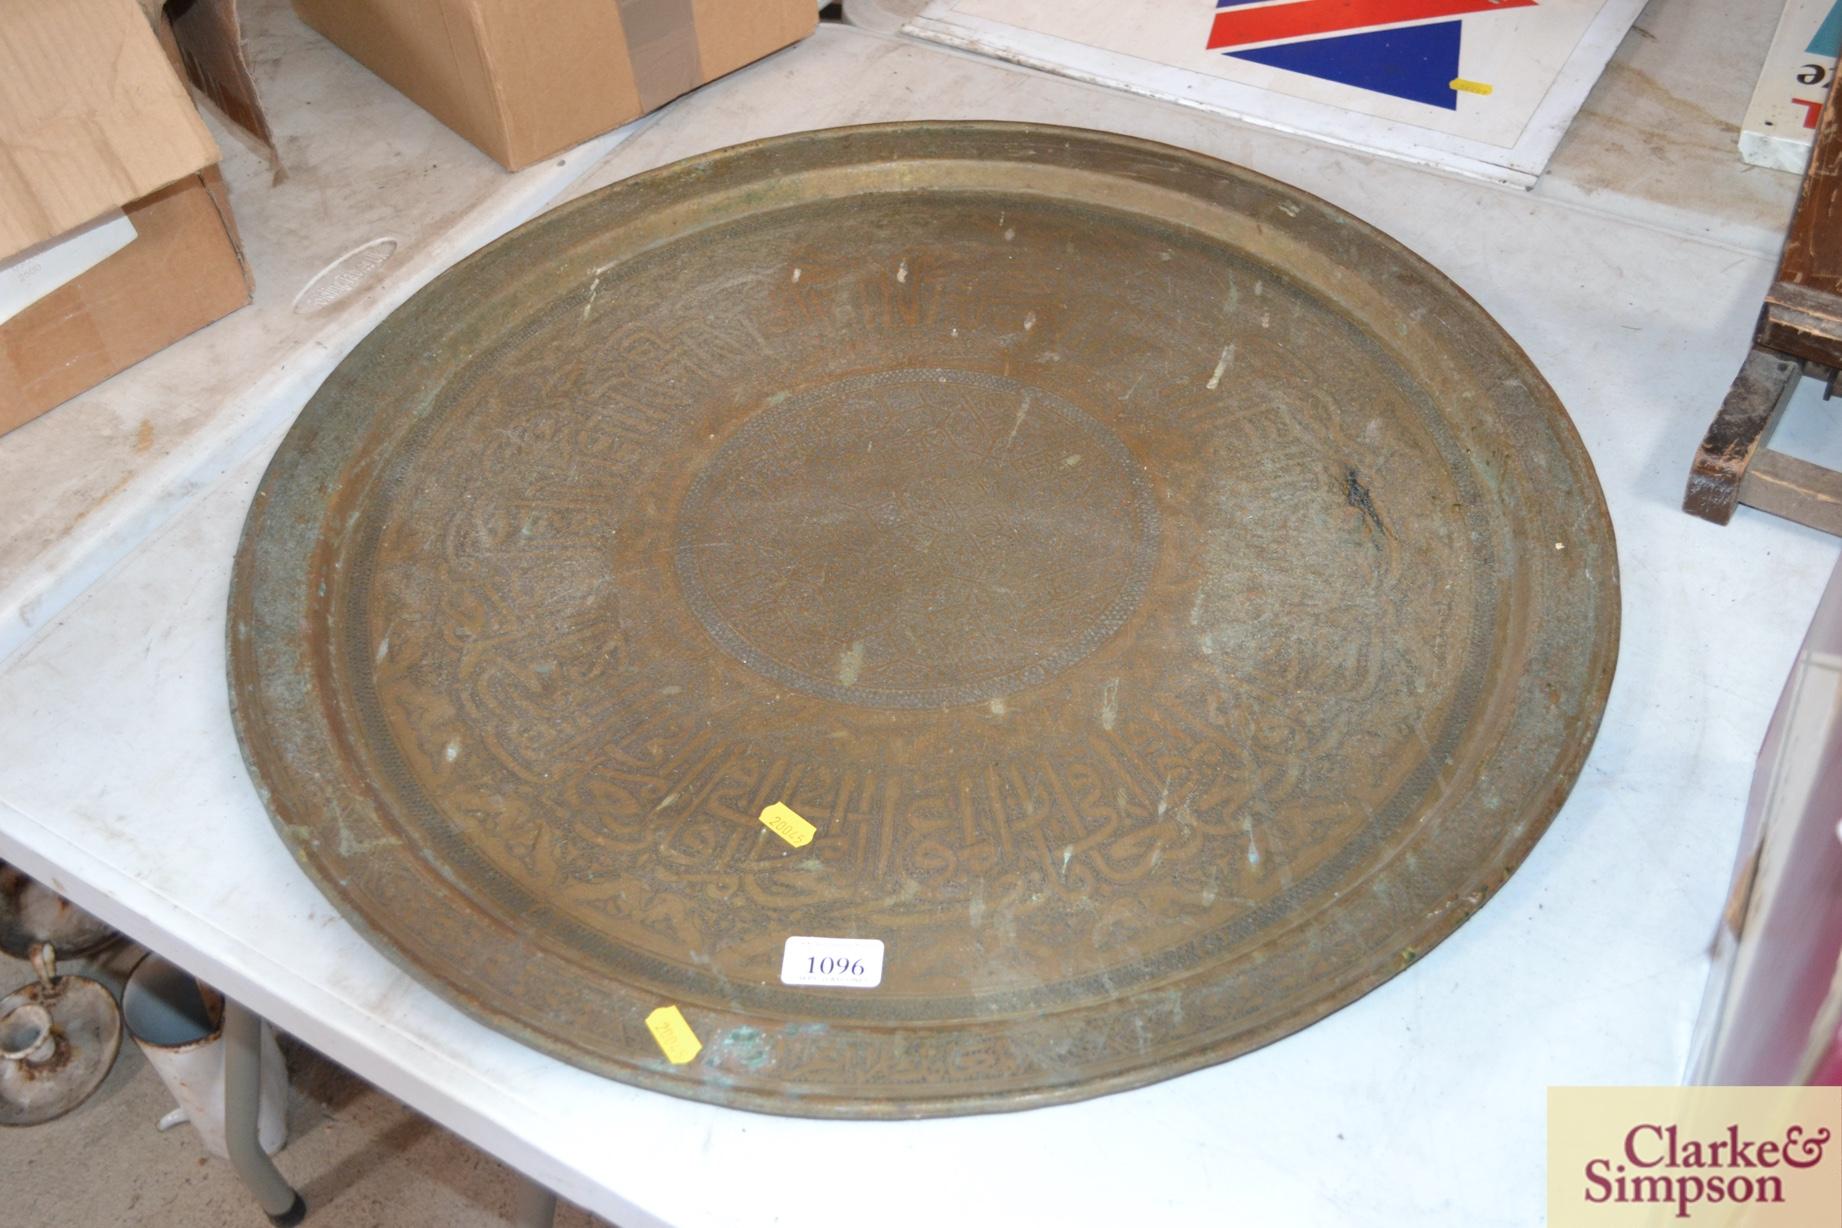 An Eastern circular brass tray